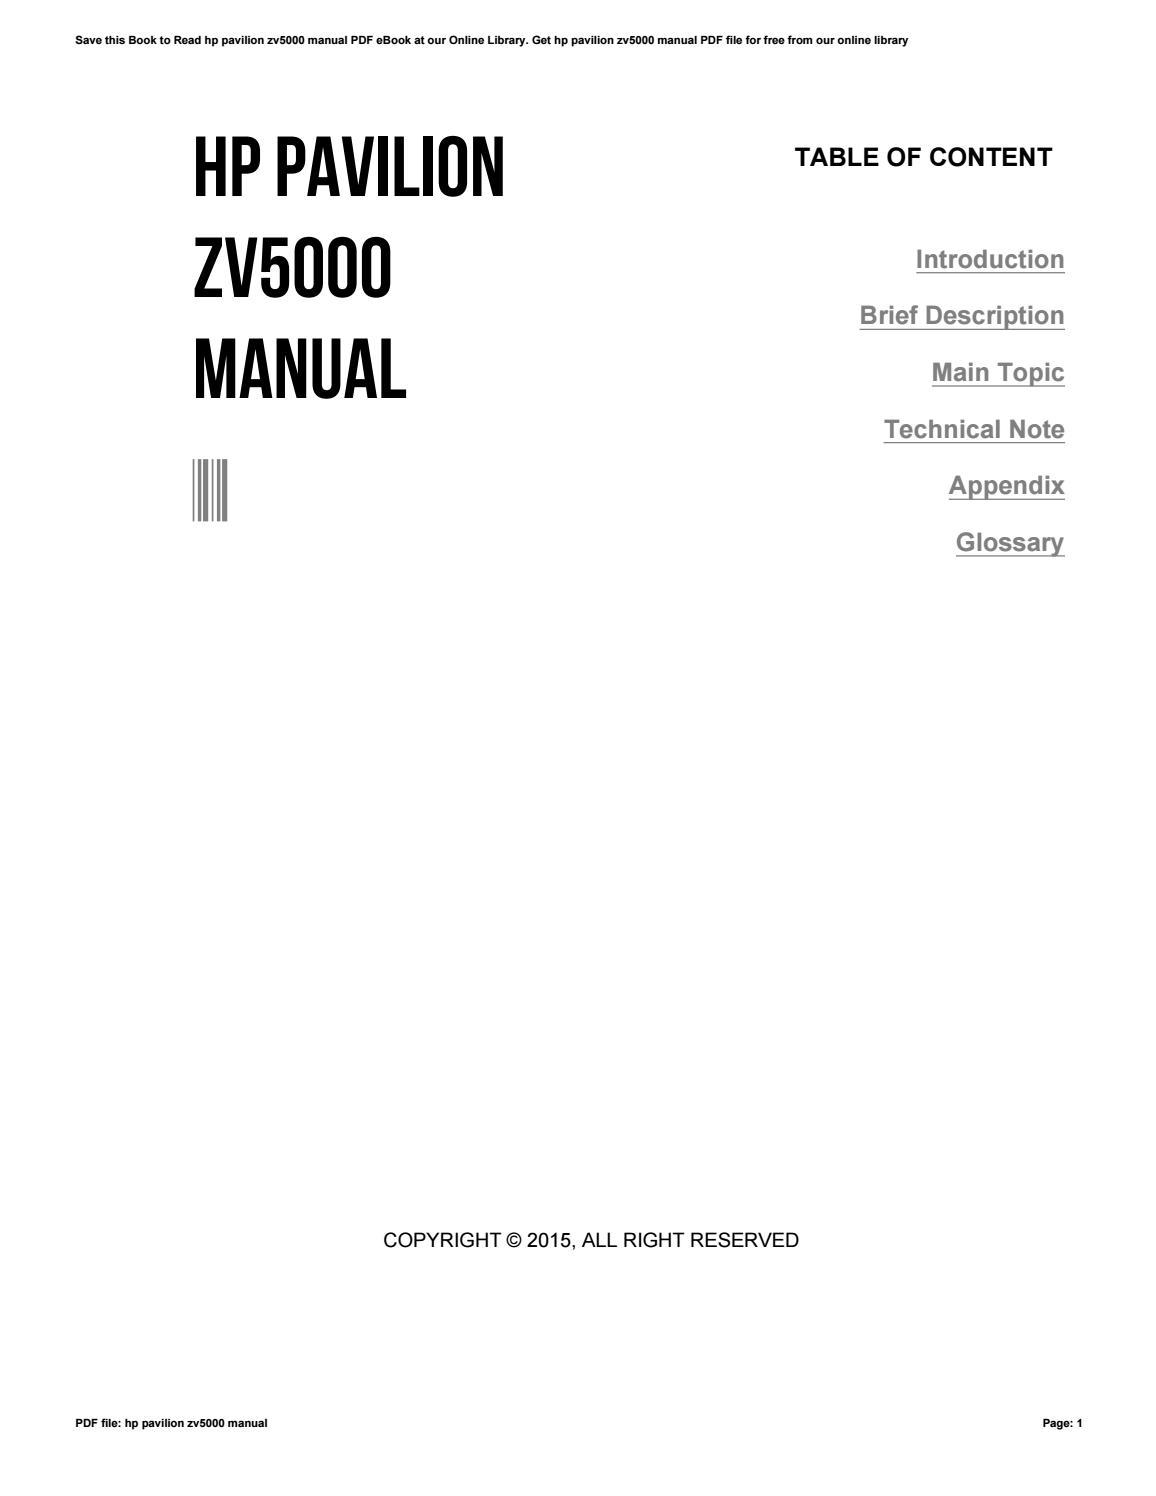 hp pavilion zv5000 manual by malove57 issuu rh issuu com